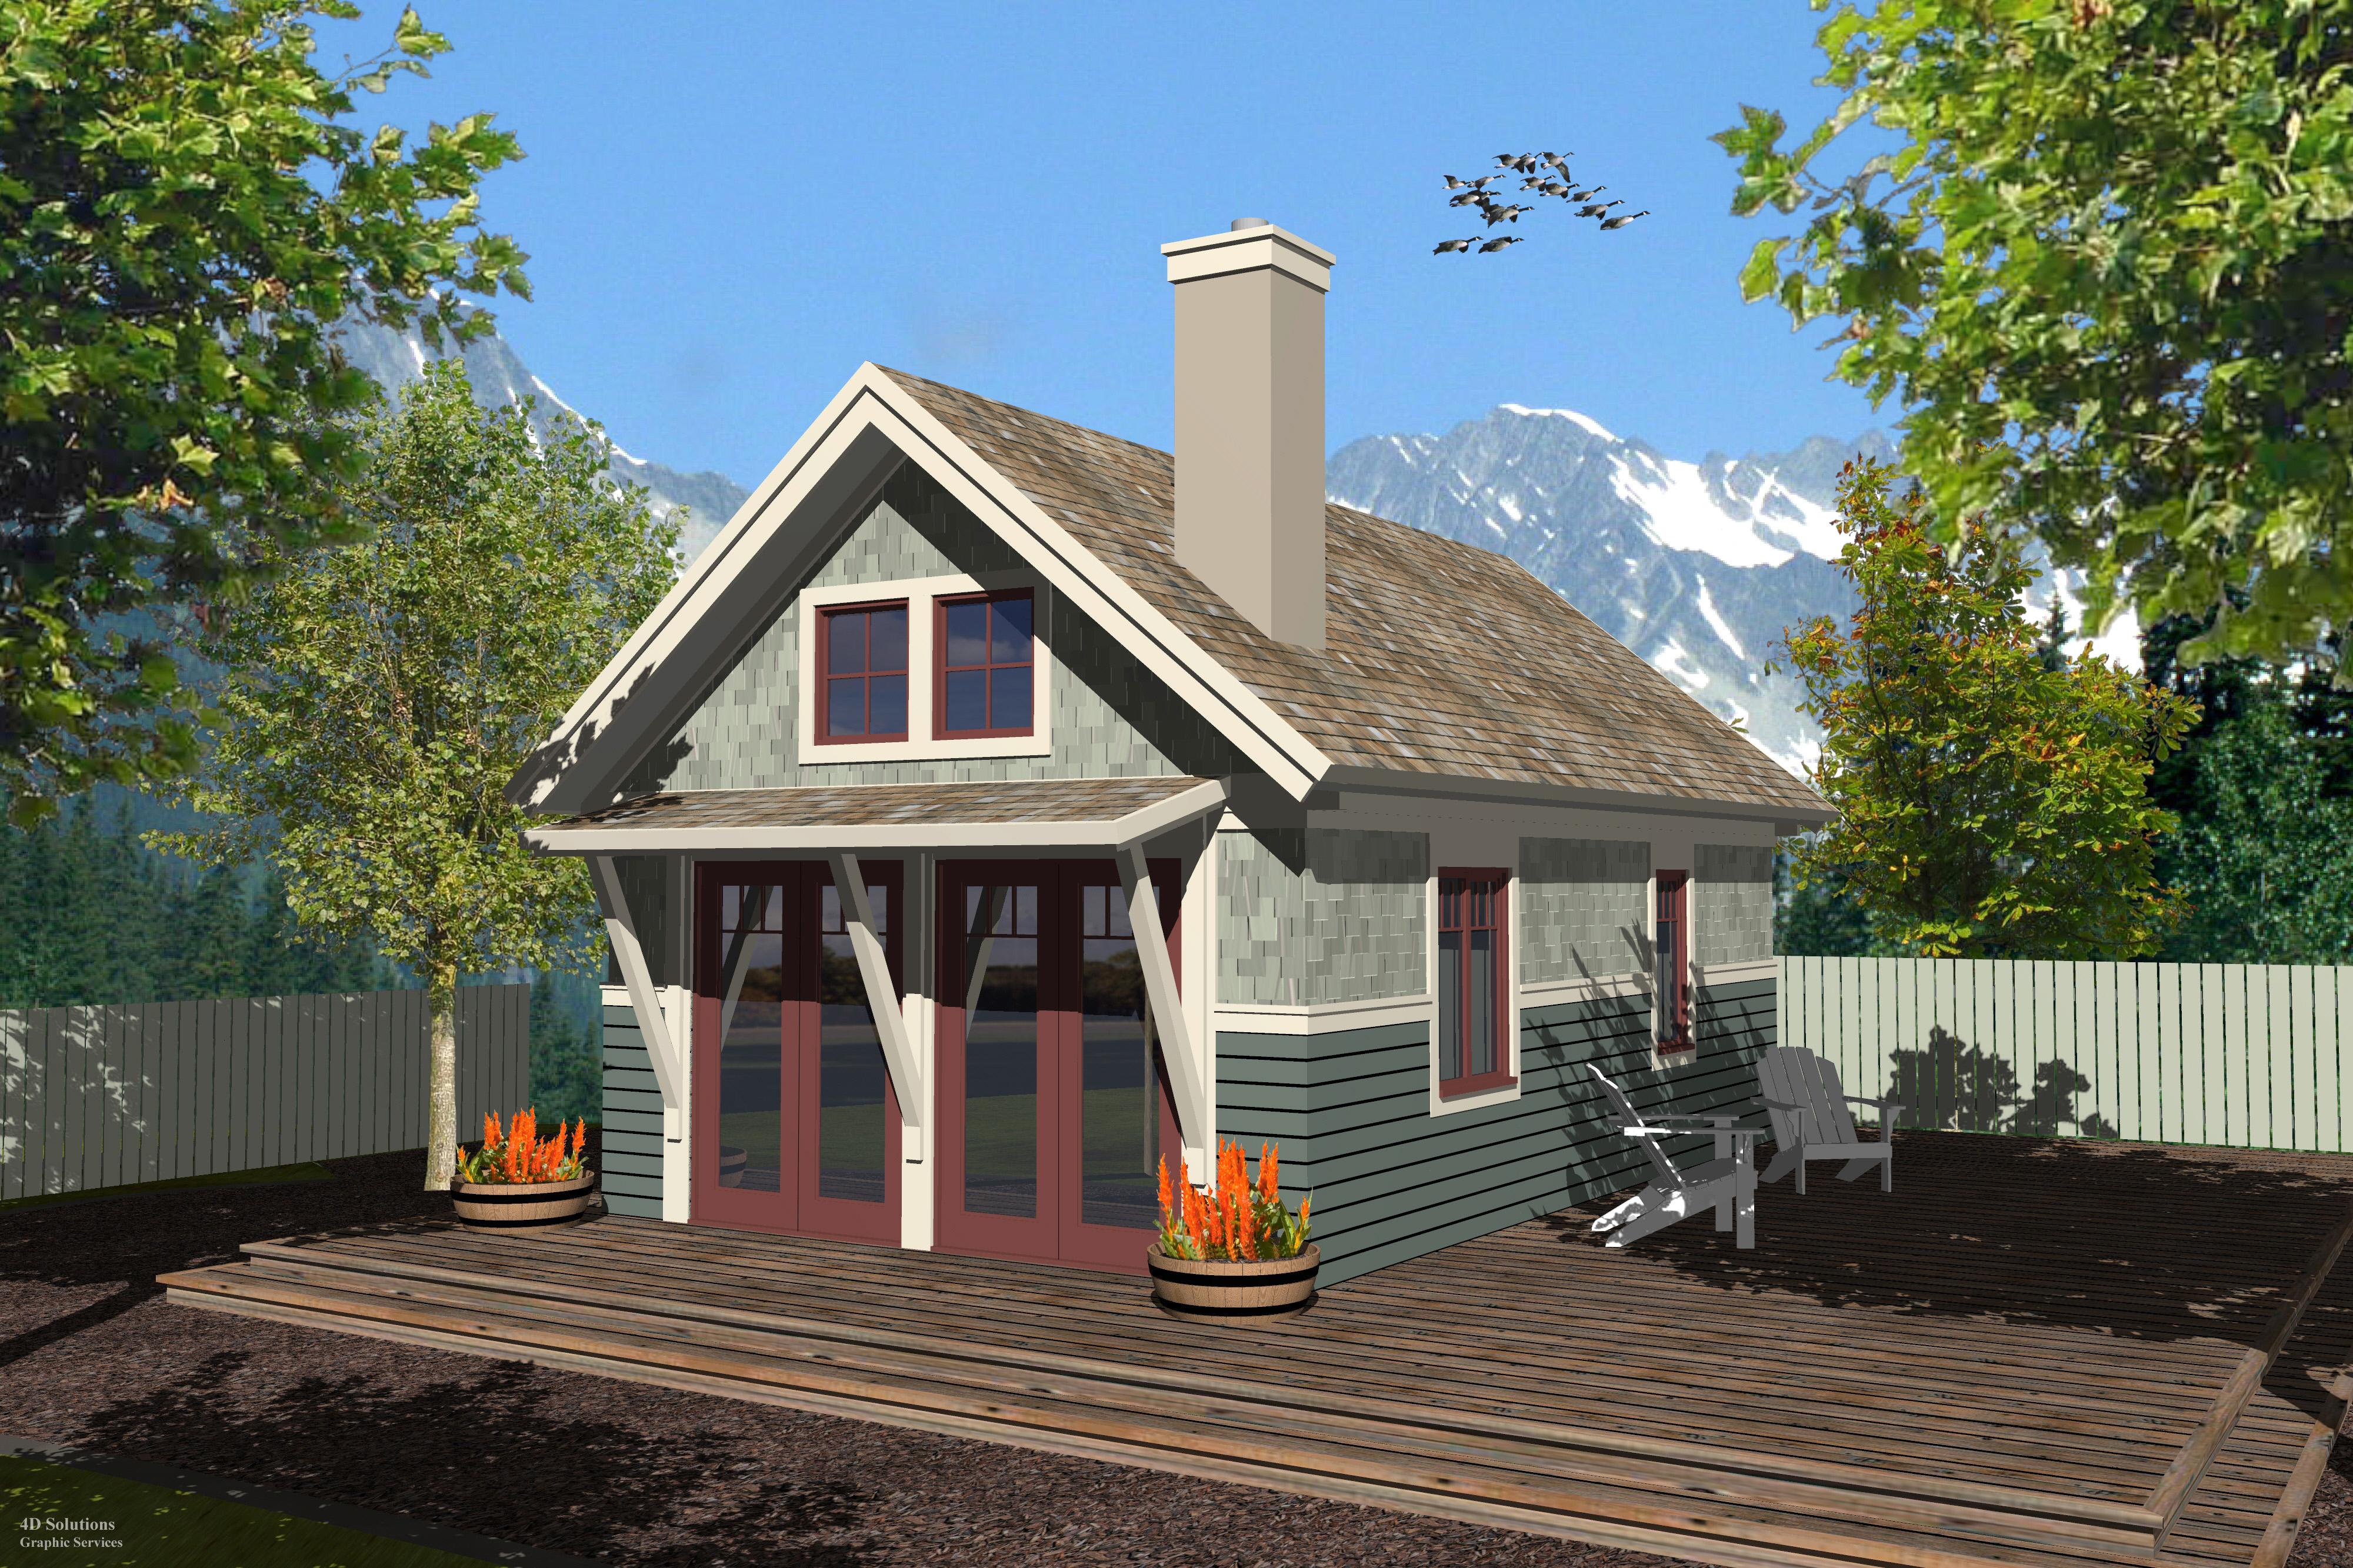 Tiny Home Designs: Craftsman WW-K-400